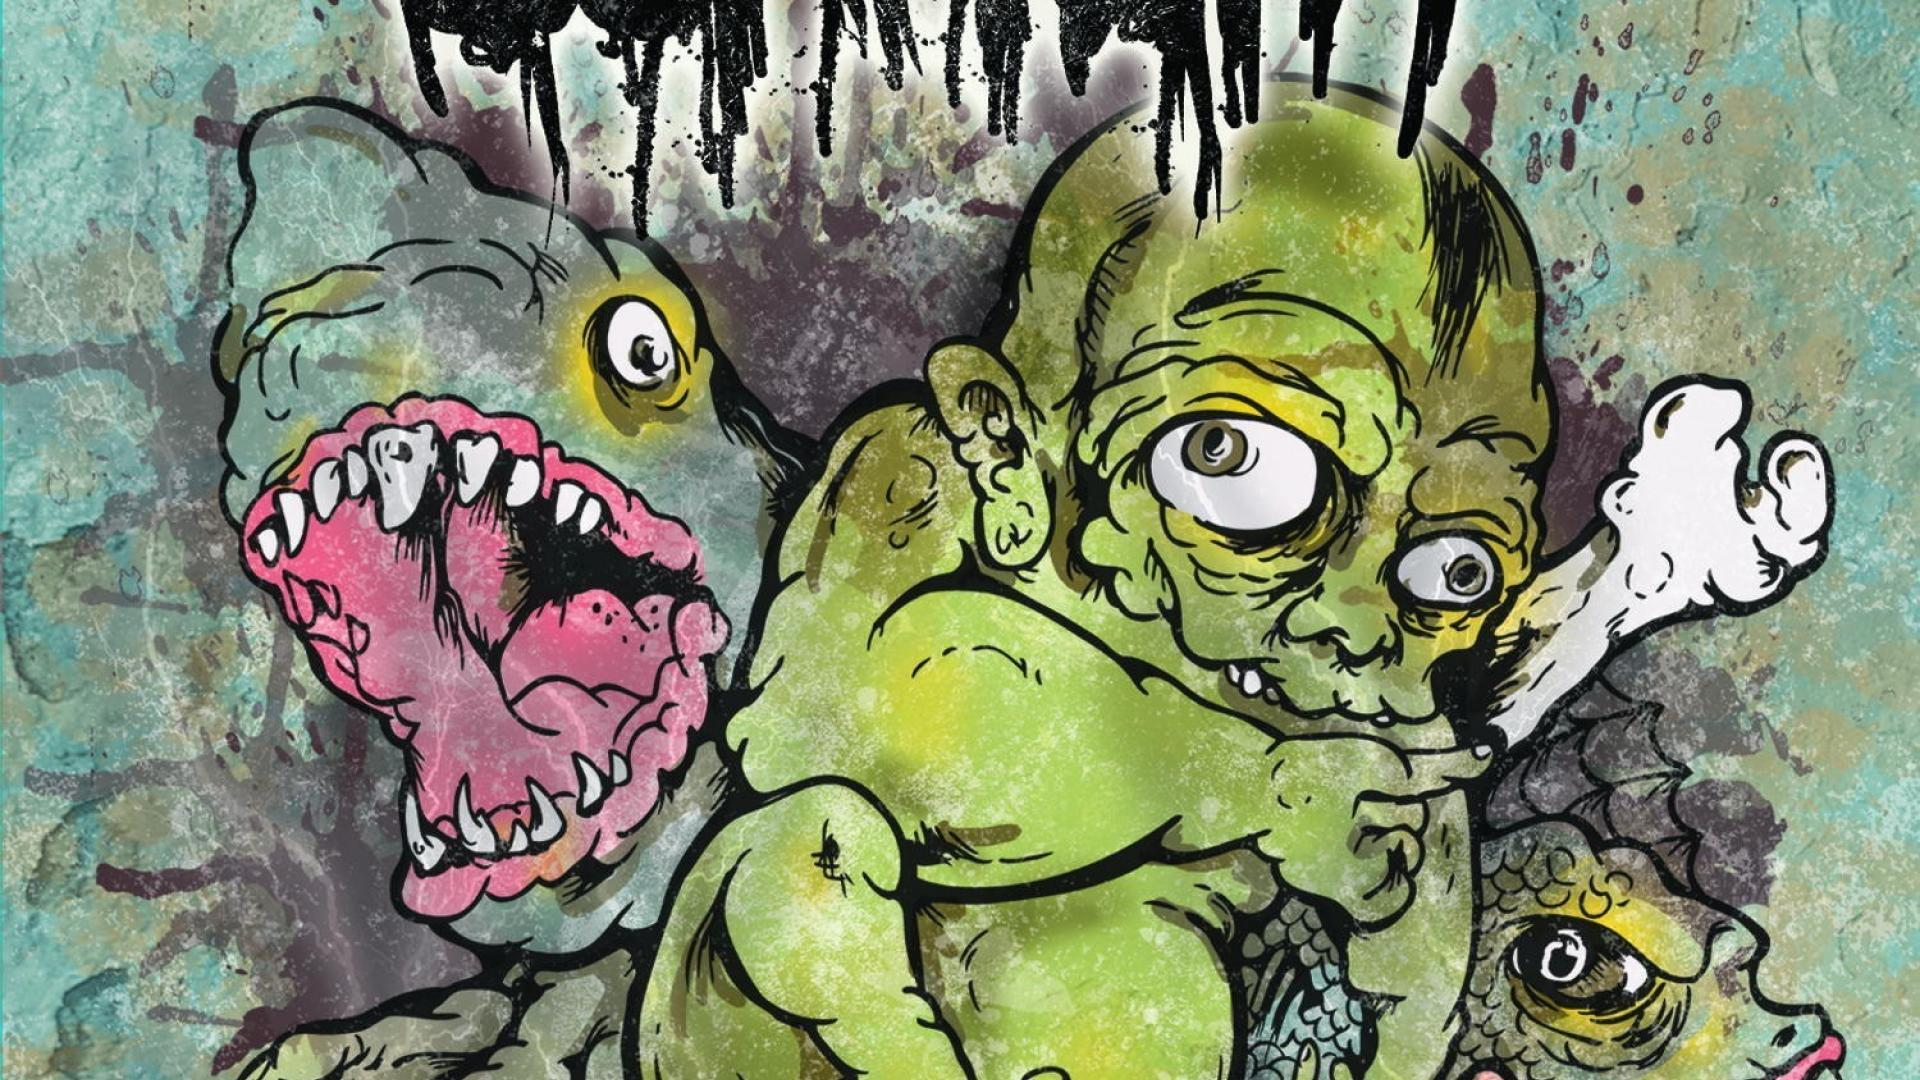 Music metalcore beginning album covers deathcore 2009 wallpaper